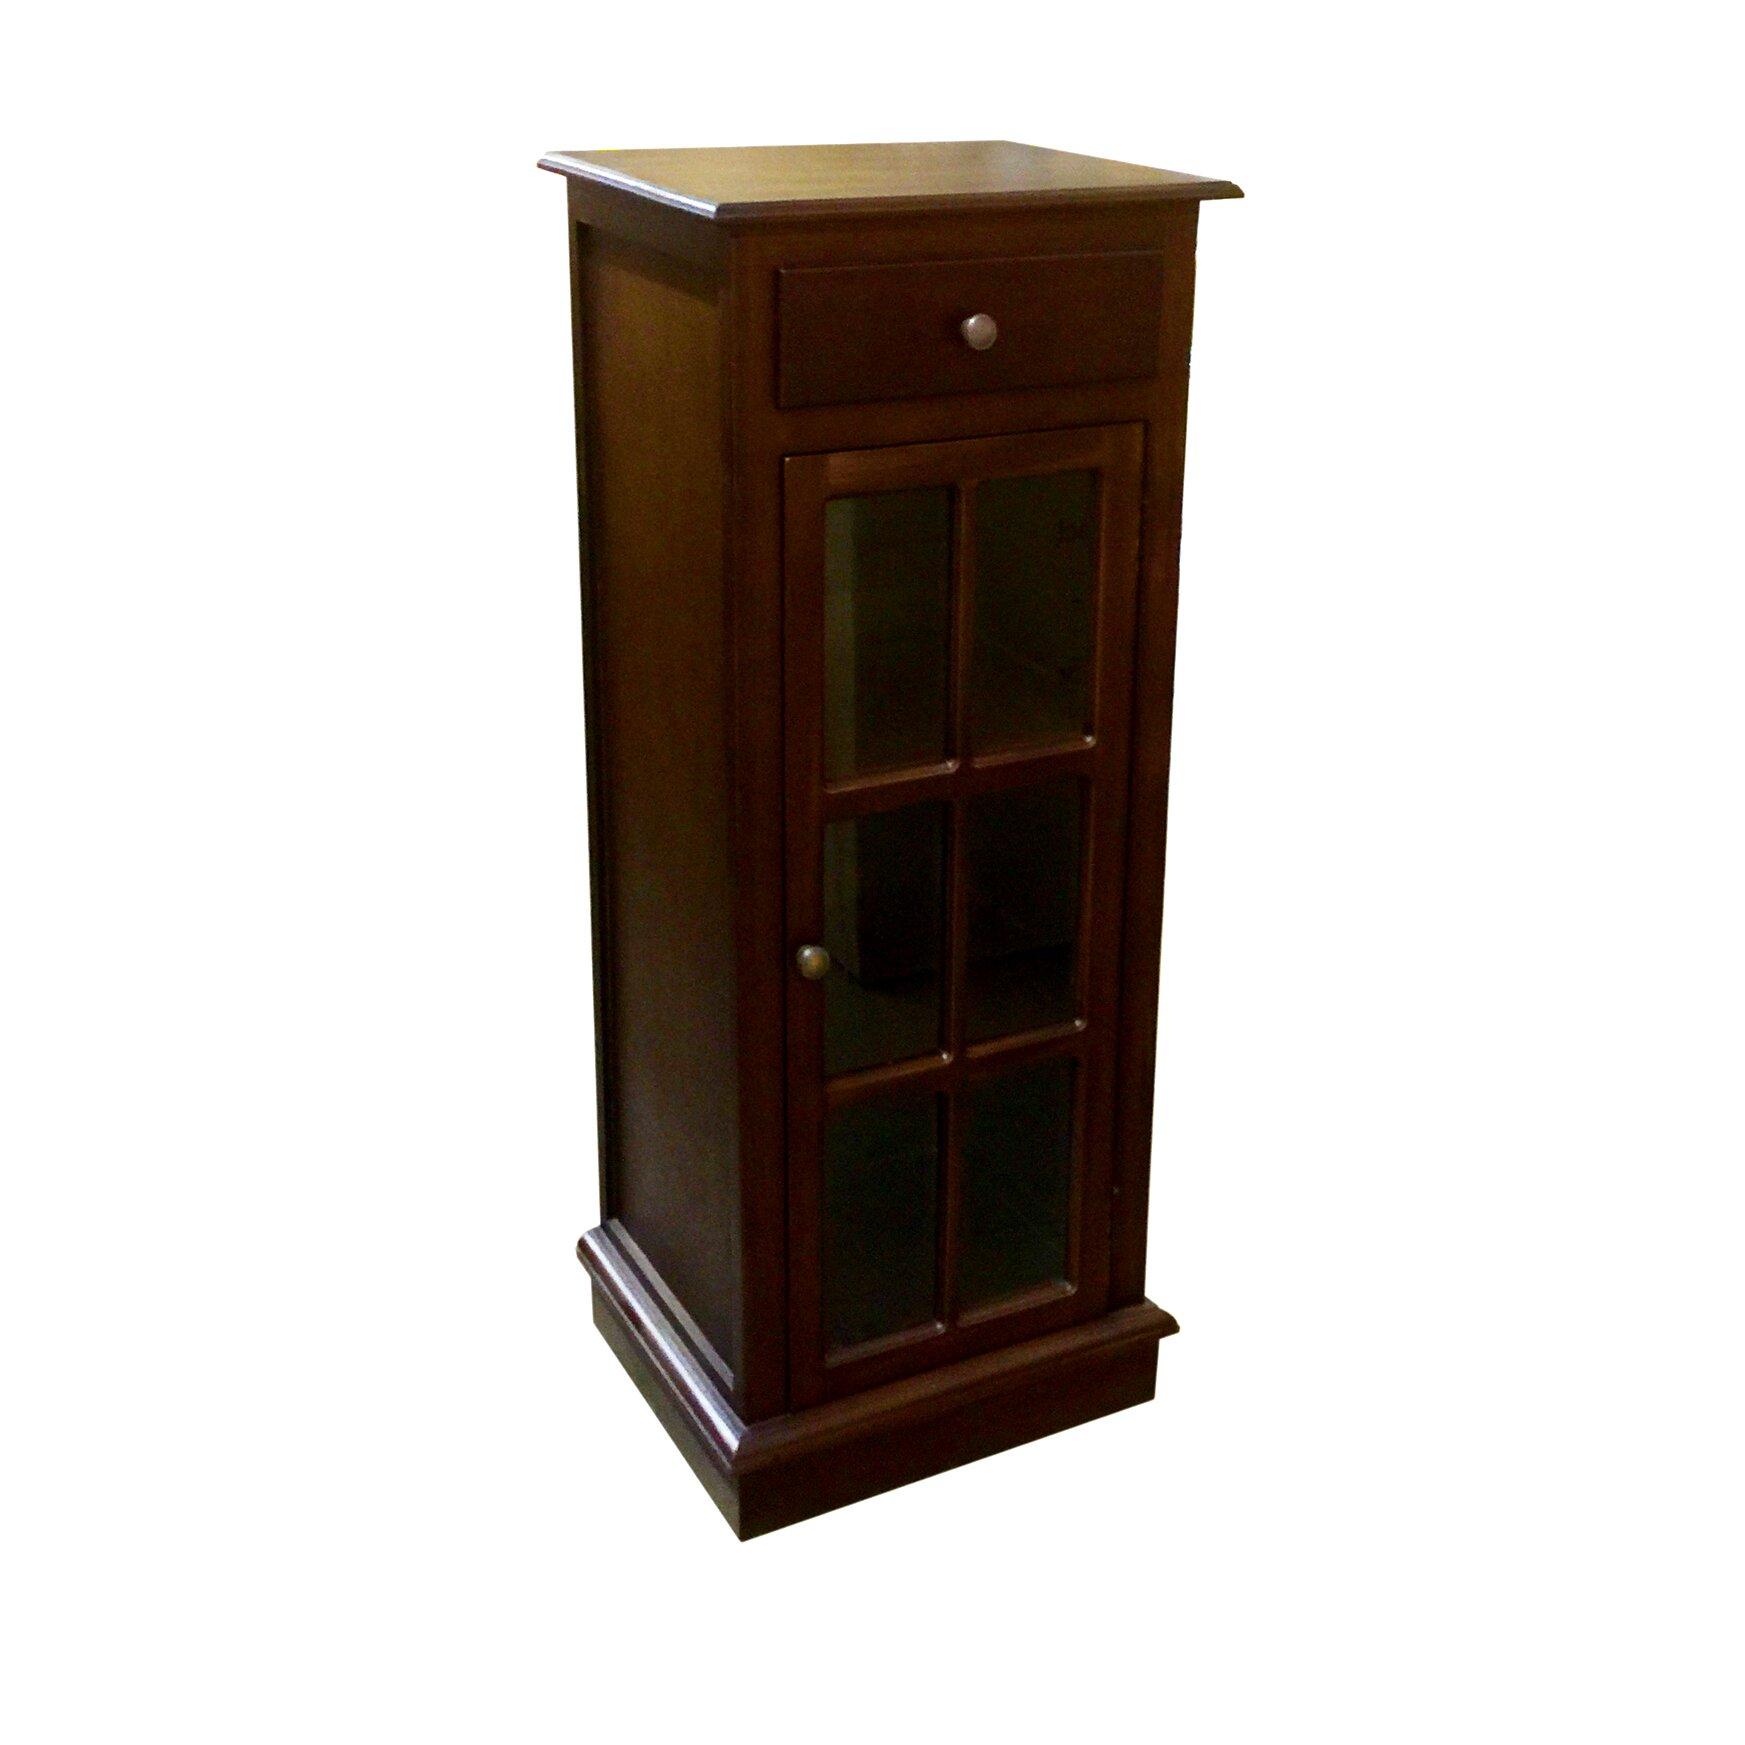 Wichita cabinet and